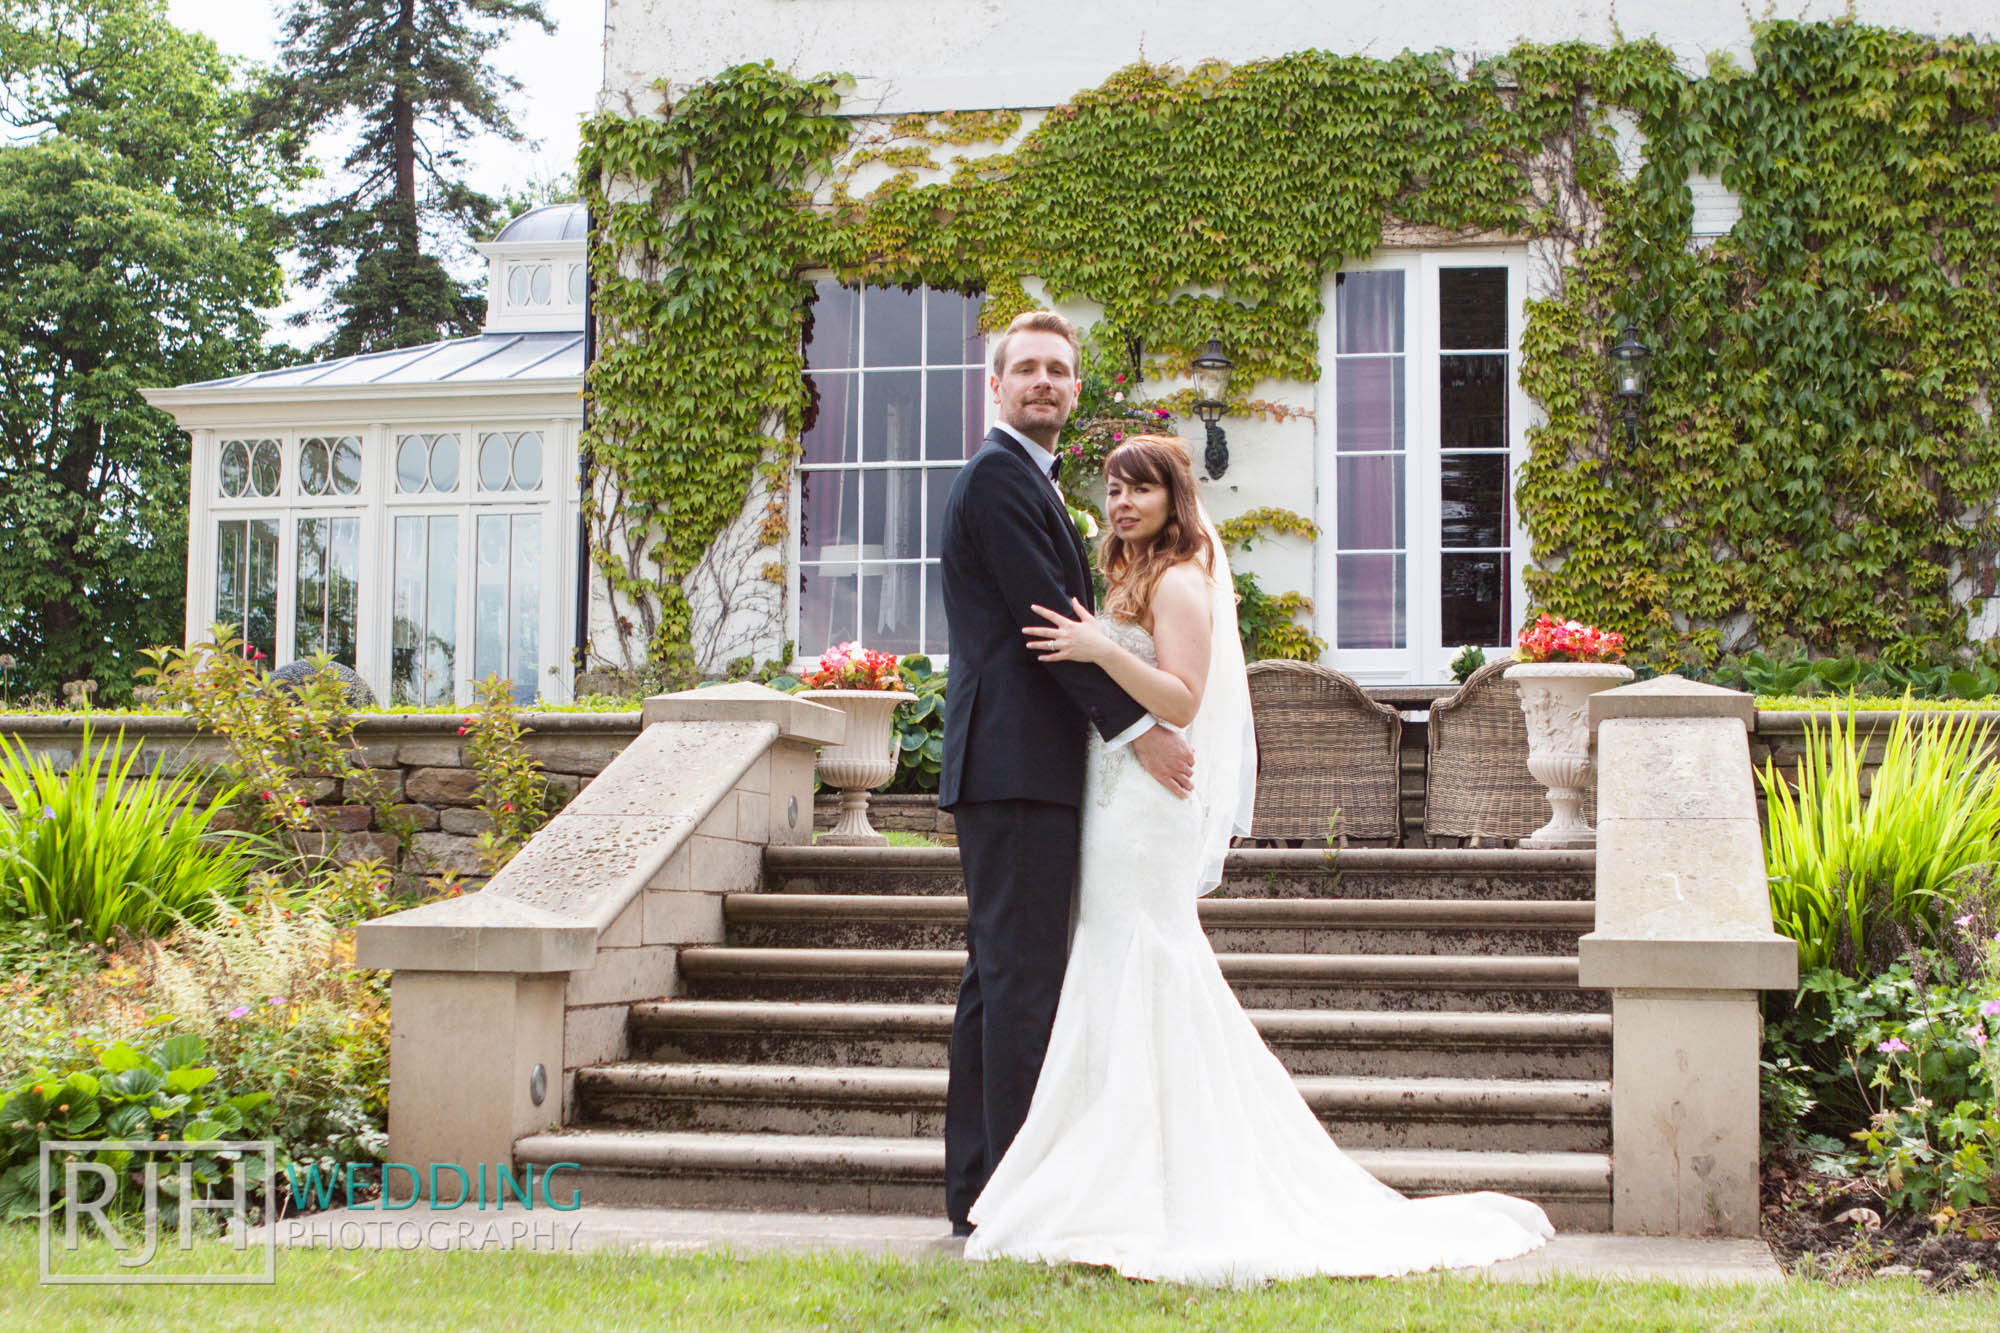 RJH Wedding Photography_2014 highlights_23.jpg